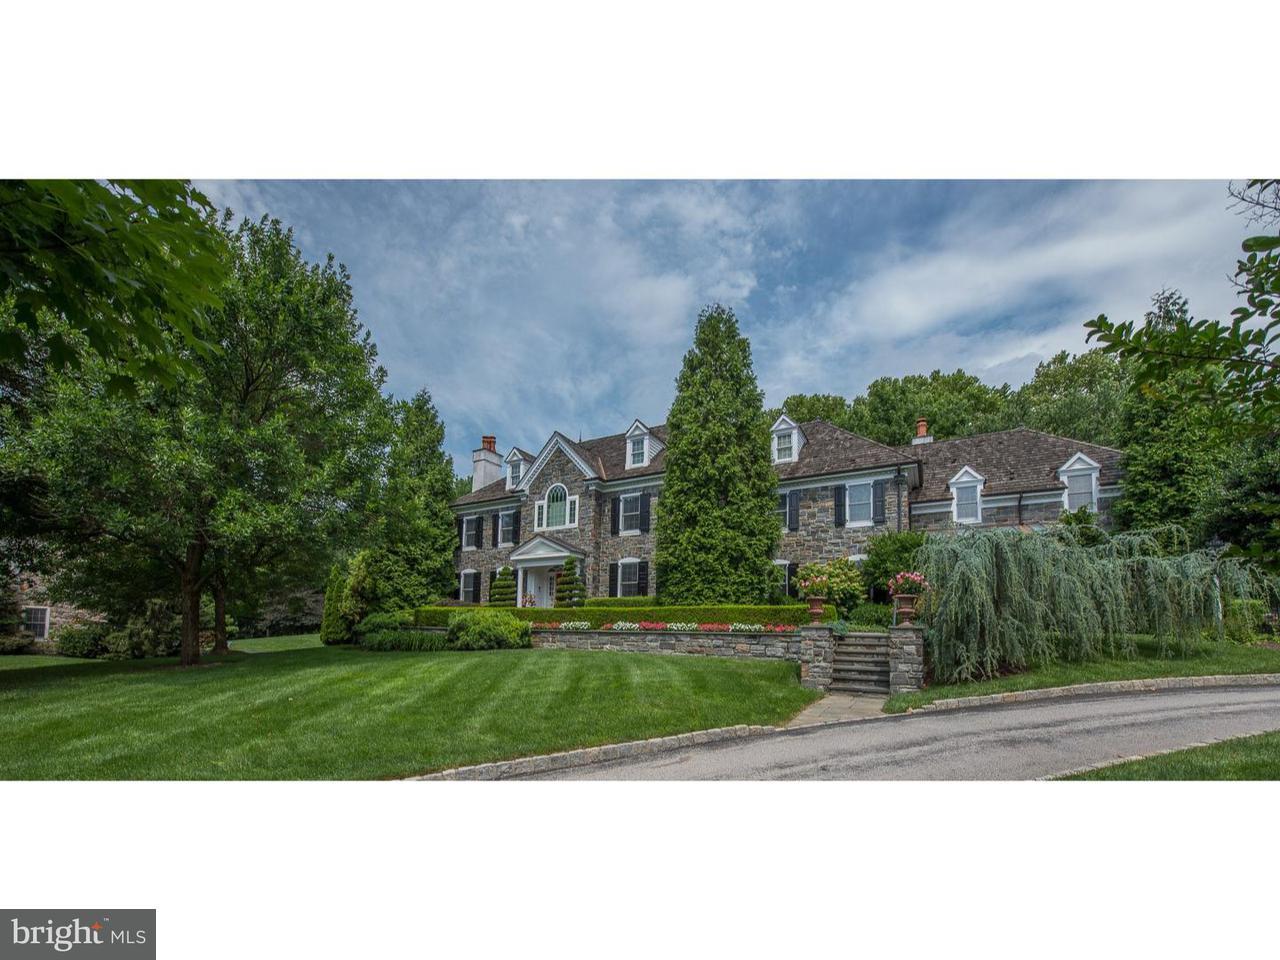 Single Family Home for Sale at 1461 LANES END Villanova, Pennsylvania 19085 United States